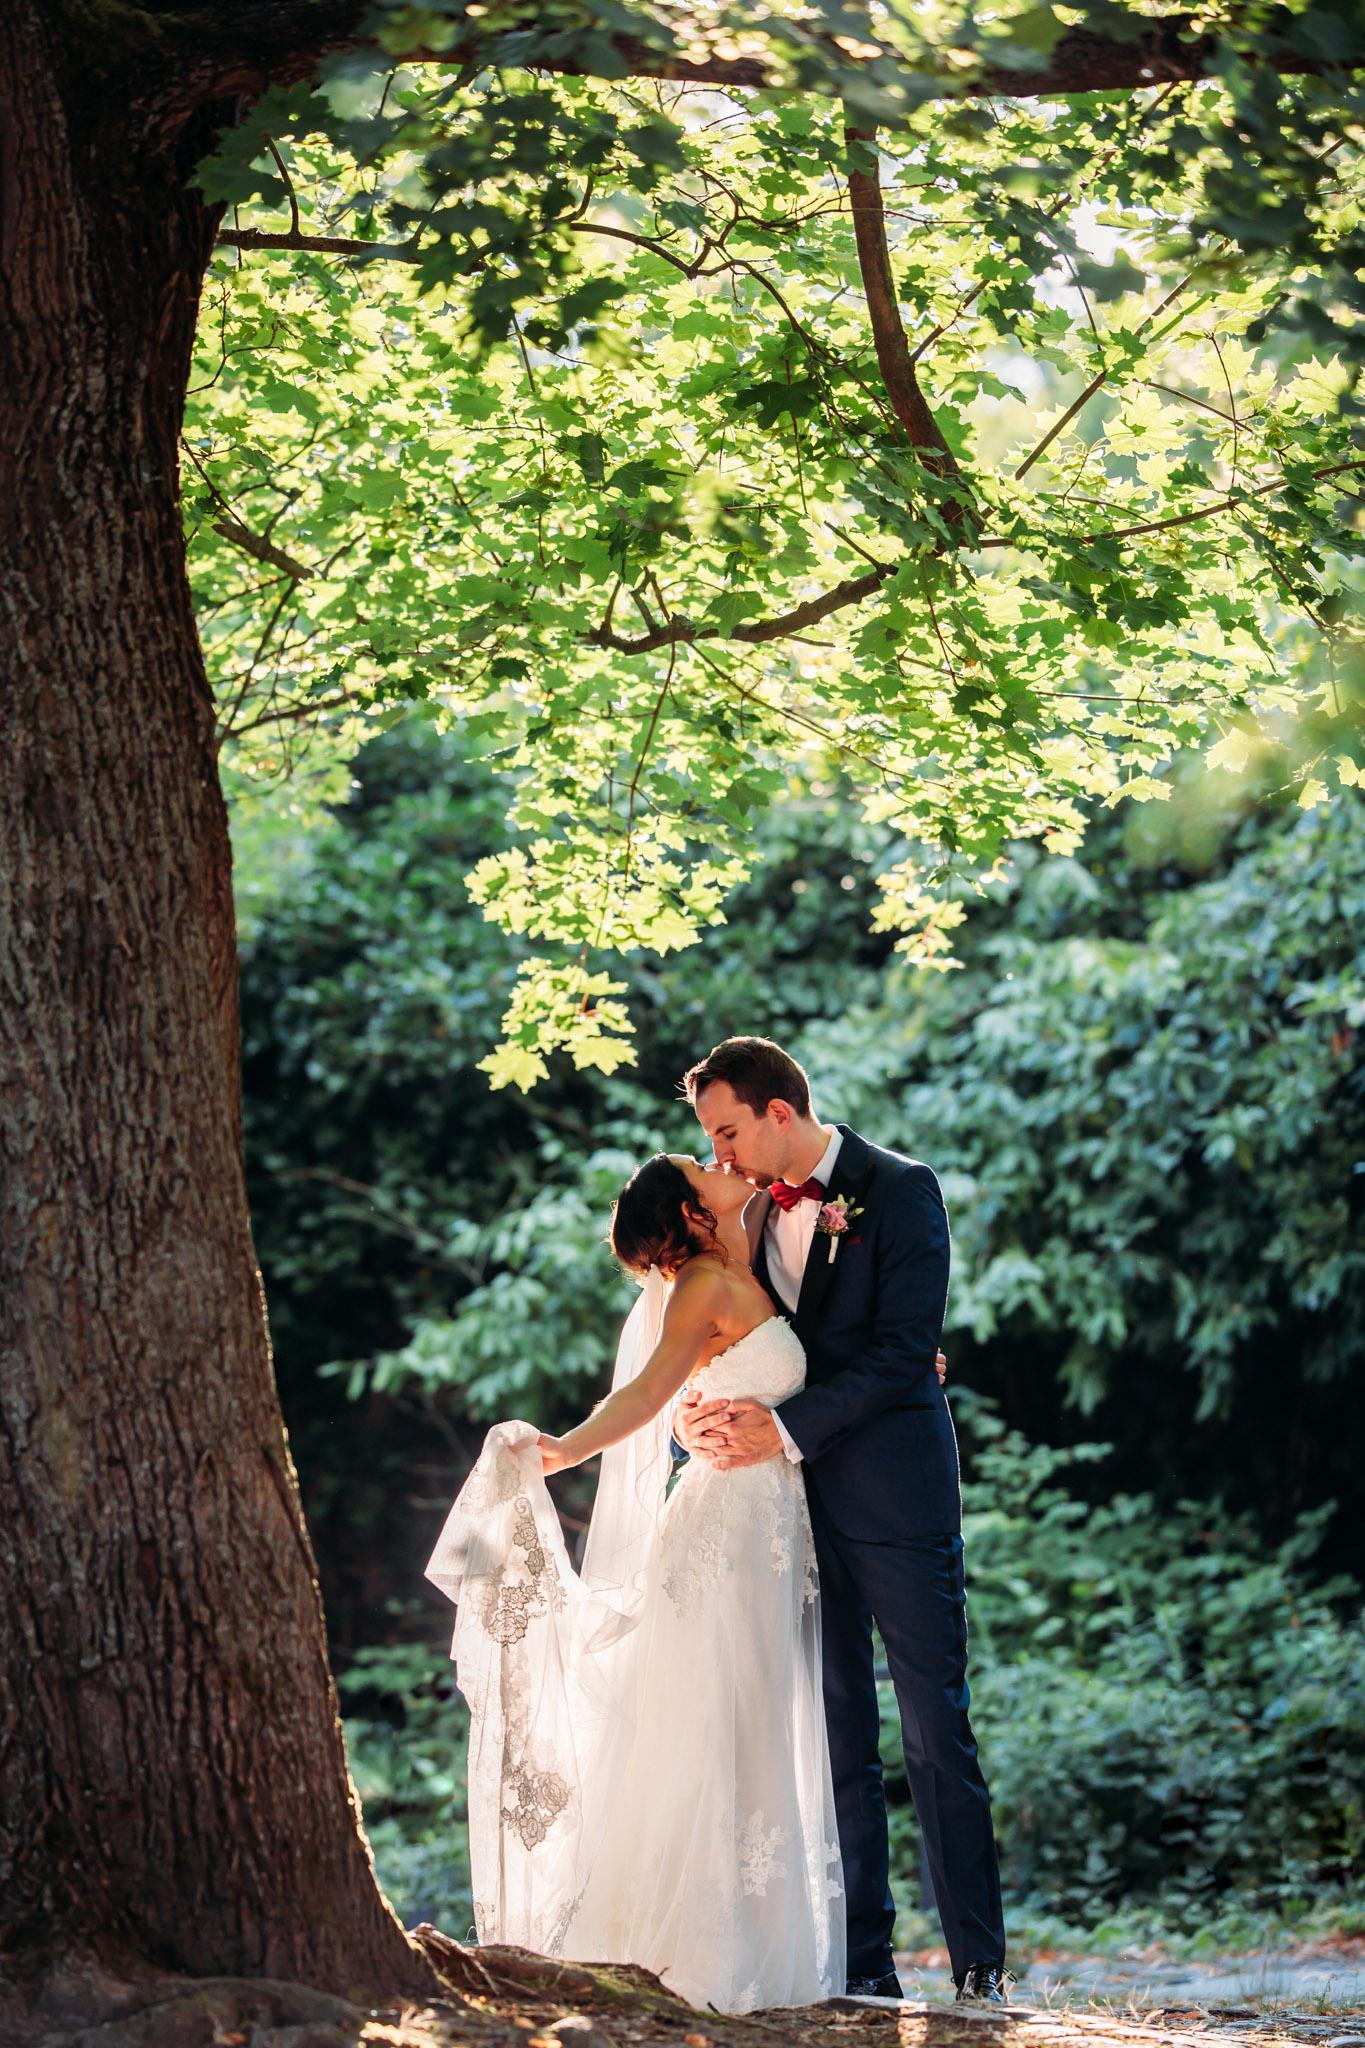 180729_Internationale_Hochzeit_Schloss_Britz_Berlin_web_0045.jpg